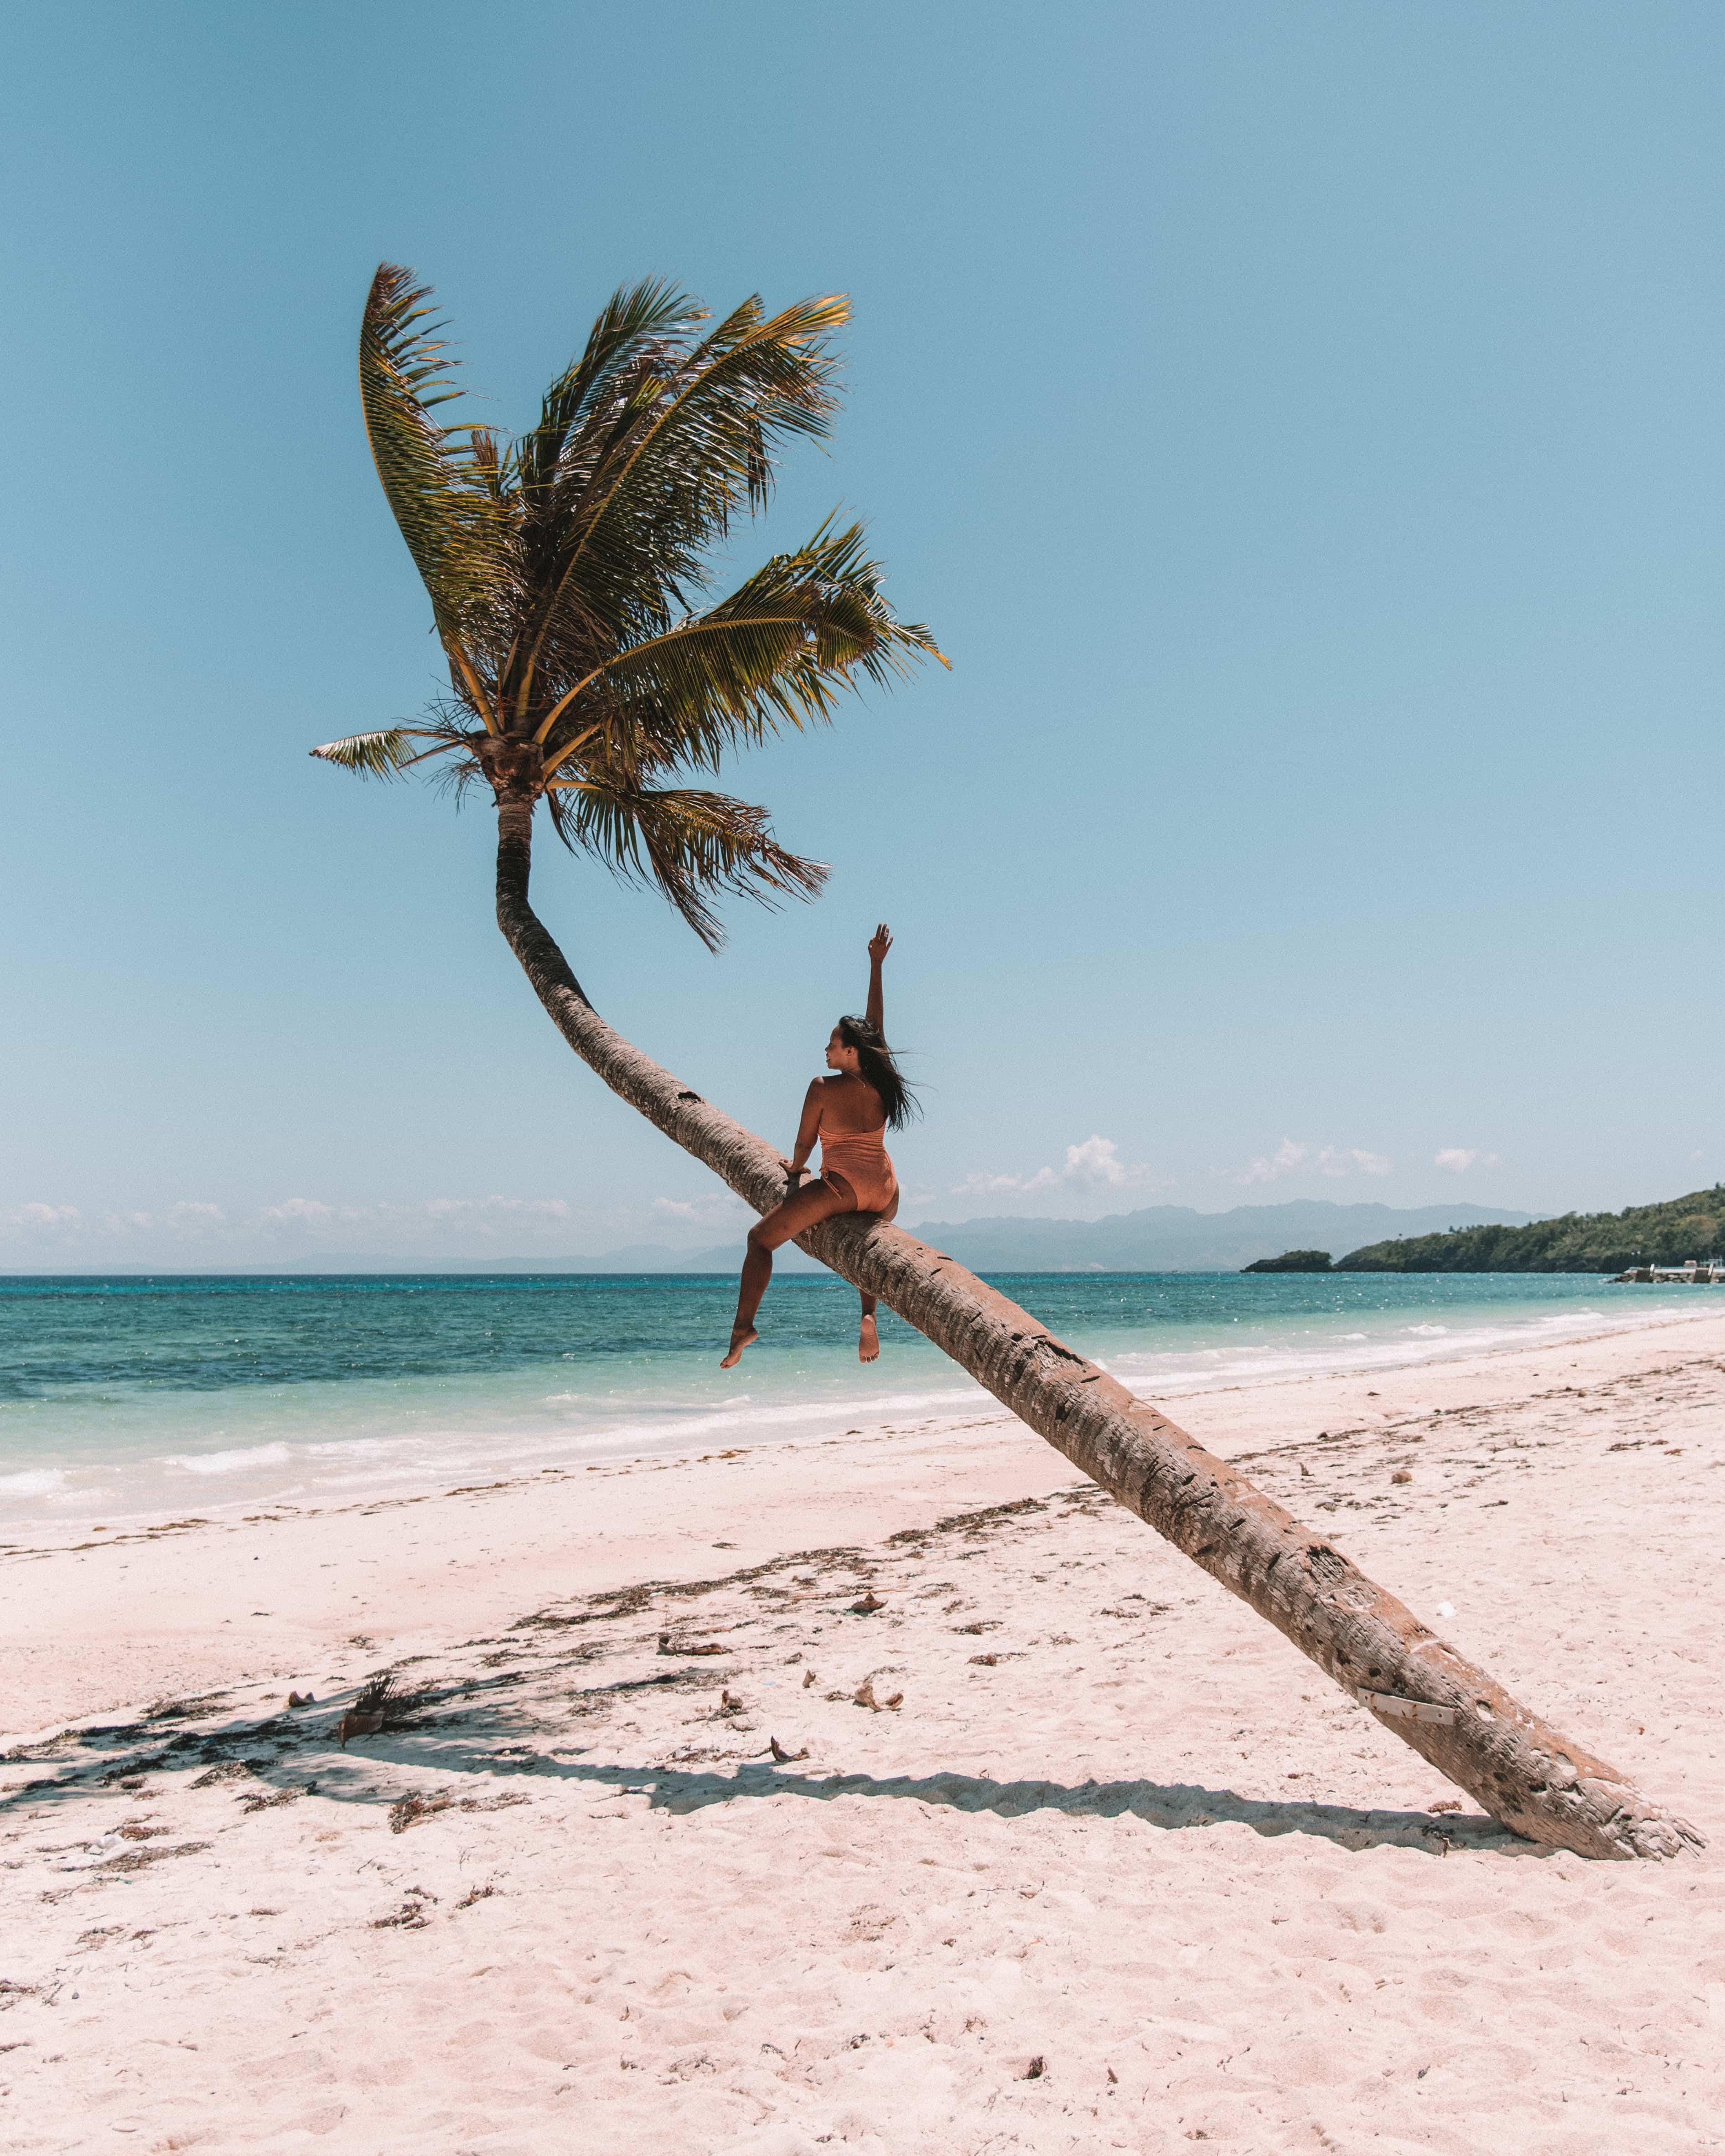 How to get to Carabao Island, Carabao Island travel guide, what to do in Carabao Island, Carabao Island, bent palm tree in Carabao island, bent palm tree